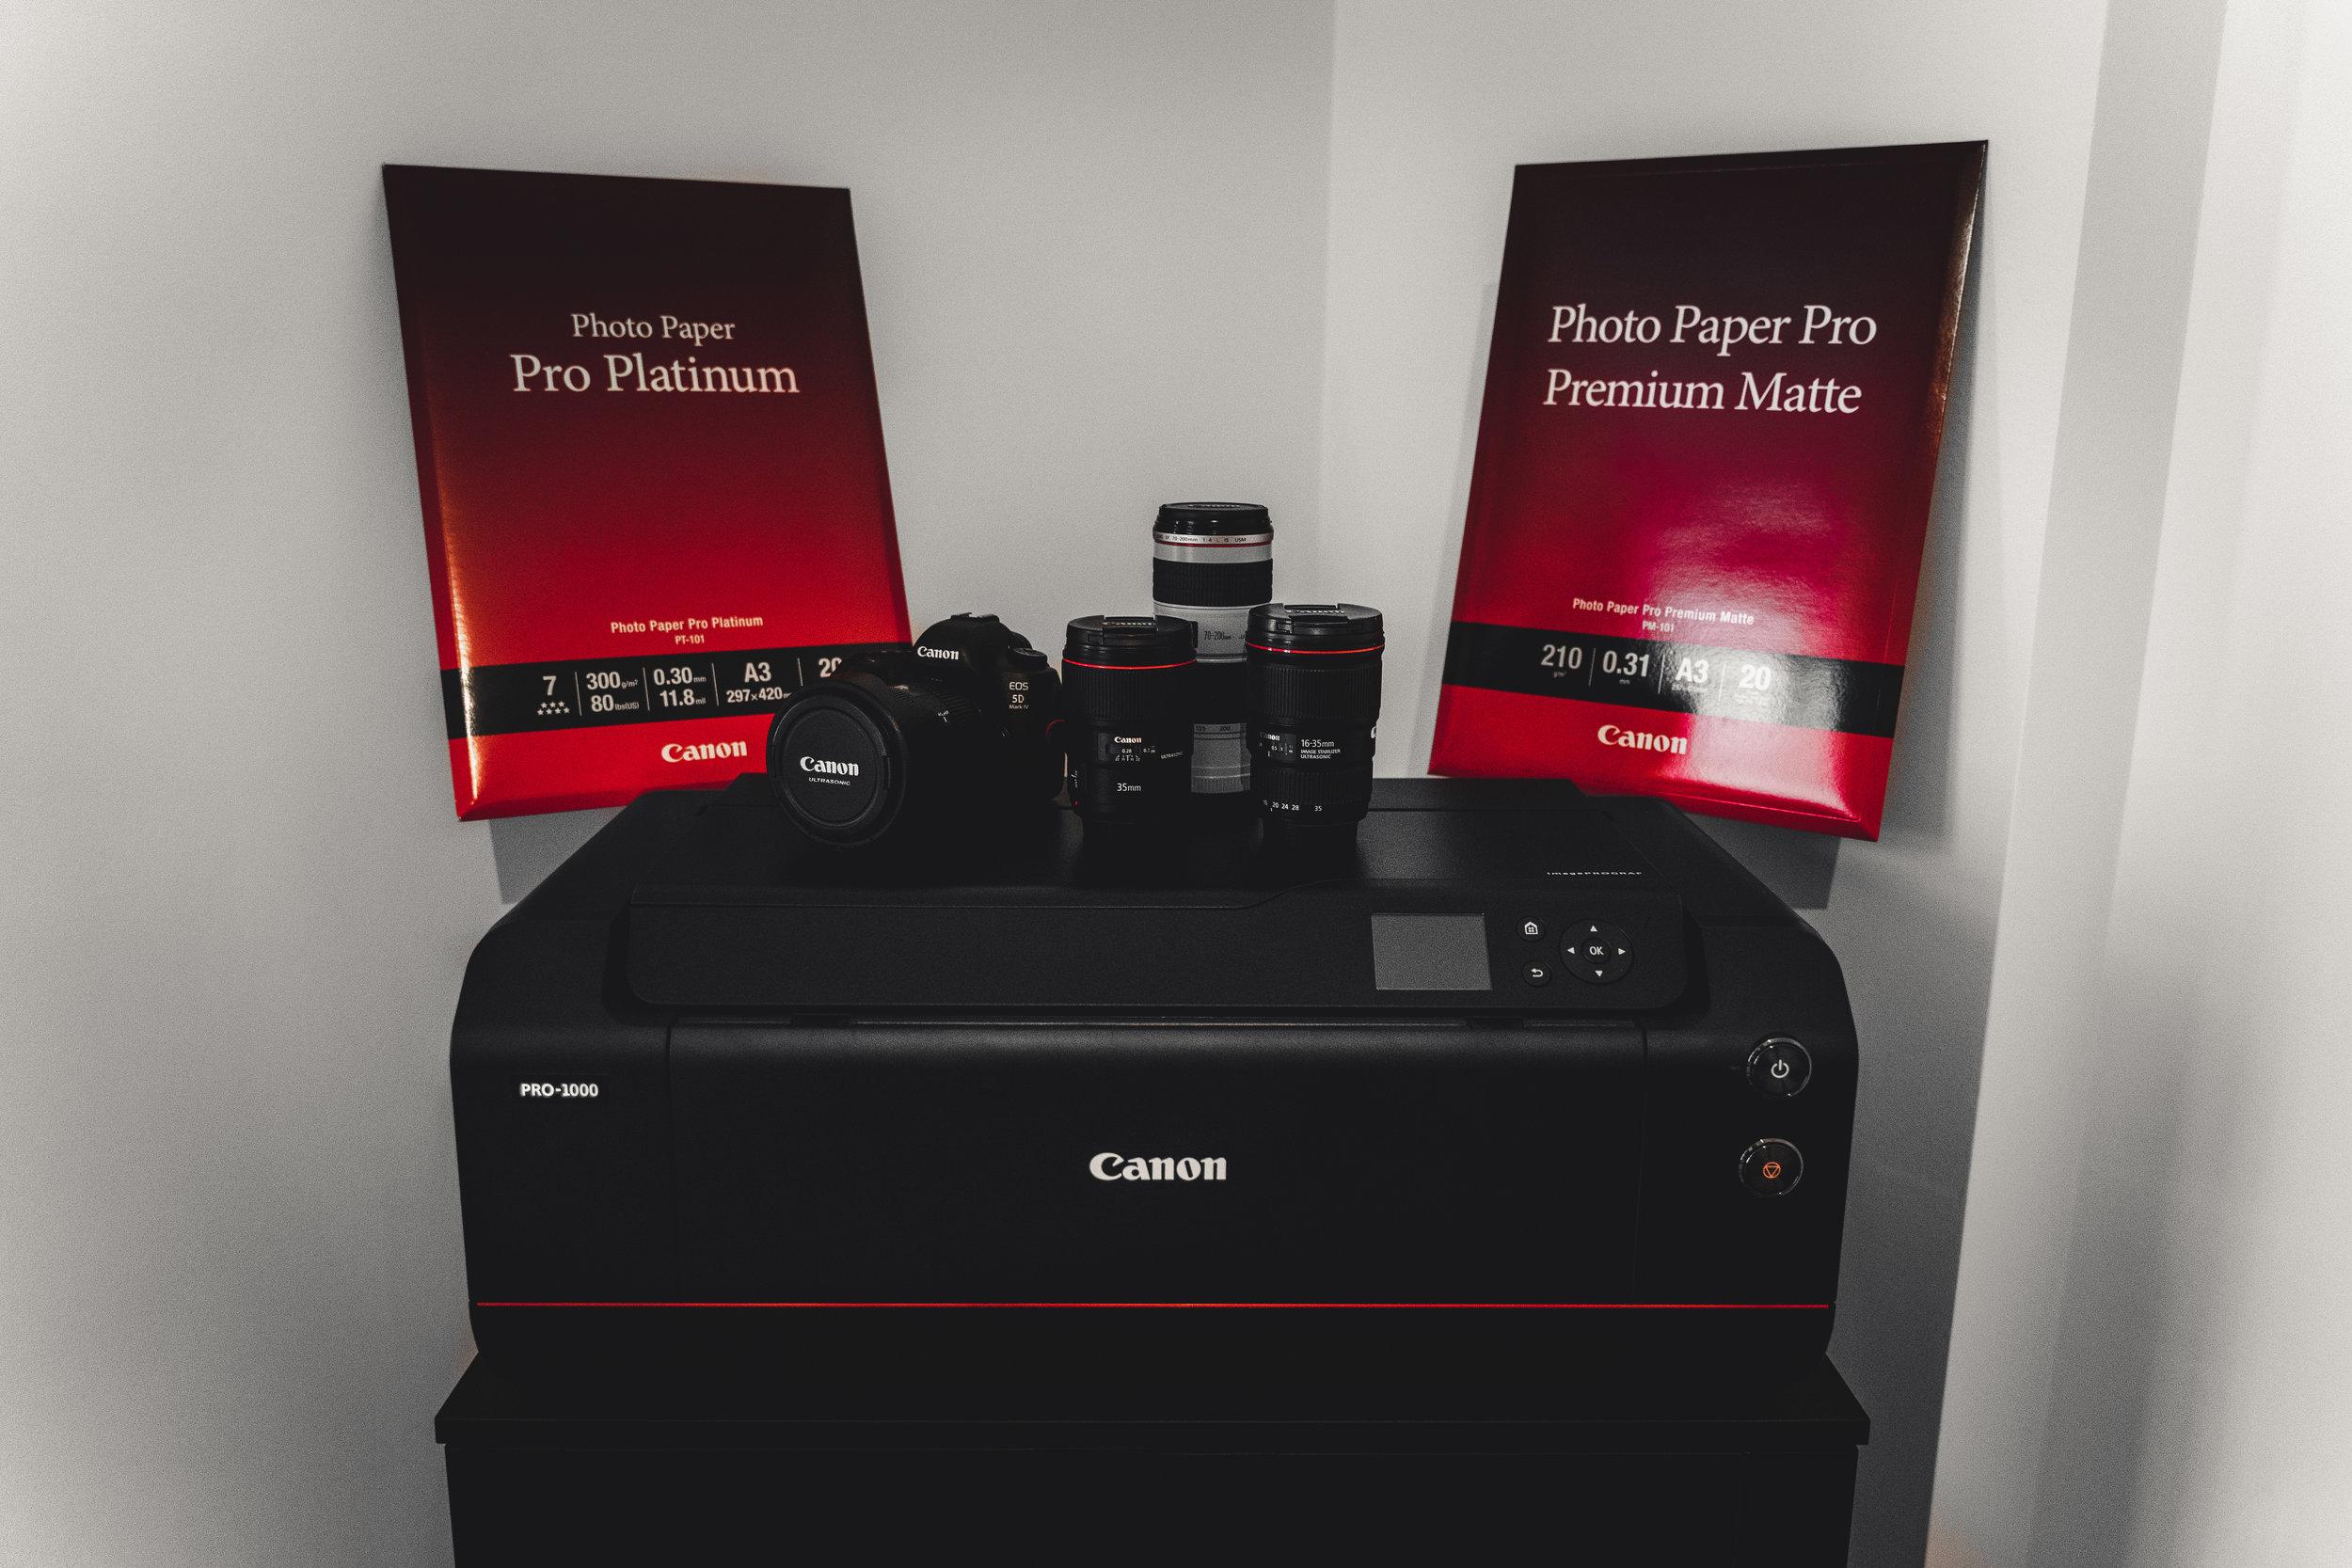 Canon imagePROGRAF PRO-1000 & Canon photo papers Pro Platinum and Pro Premium Matte